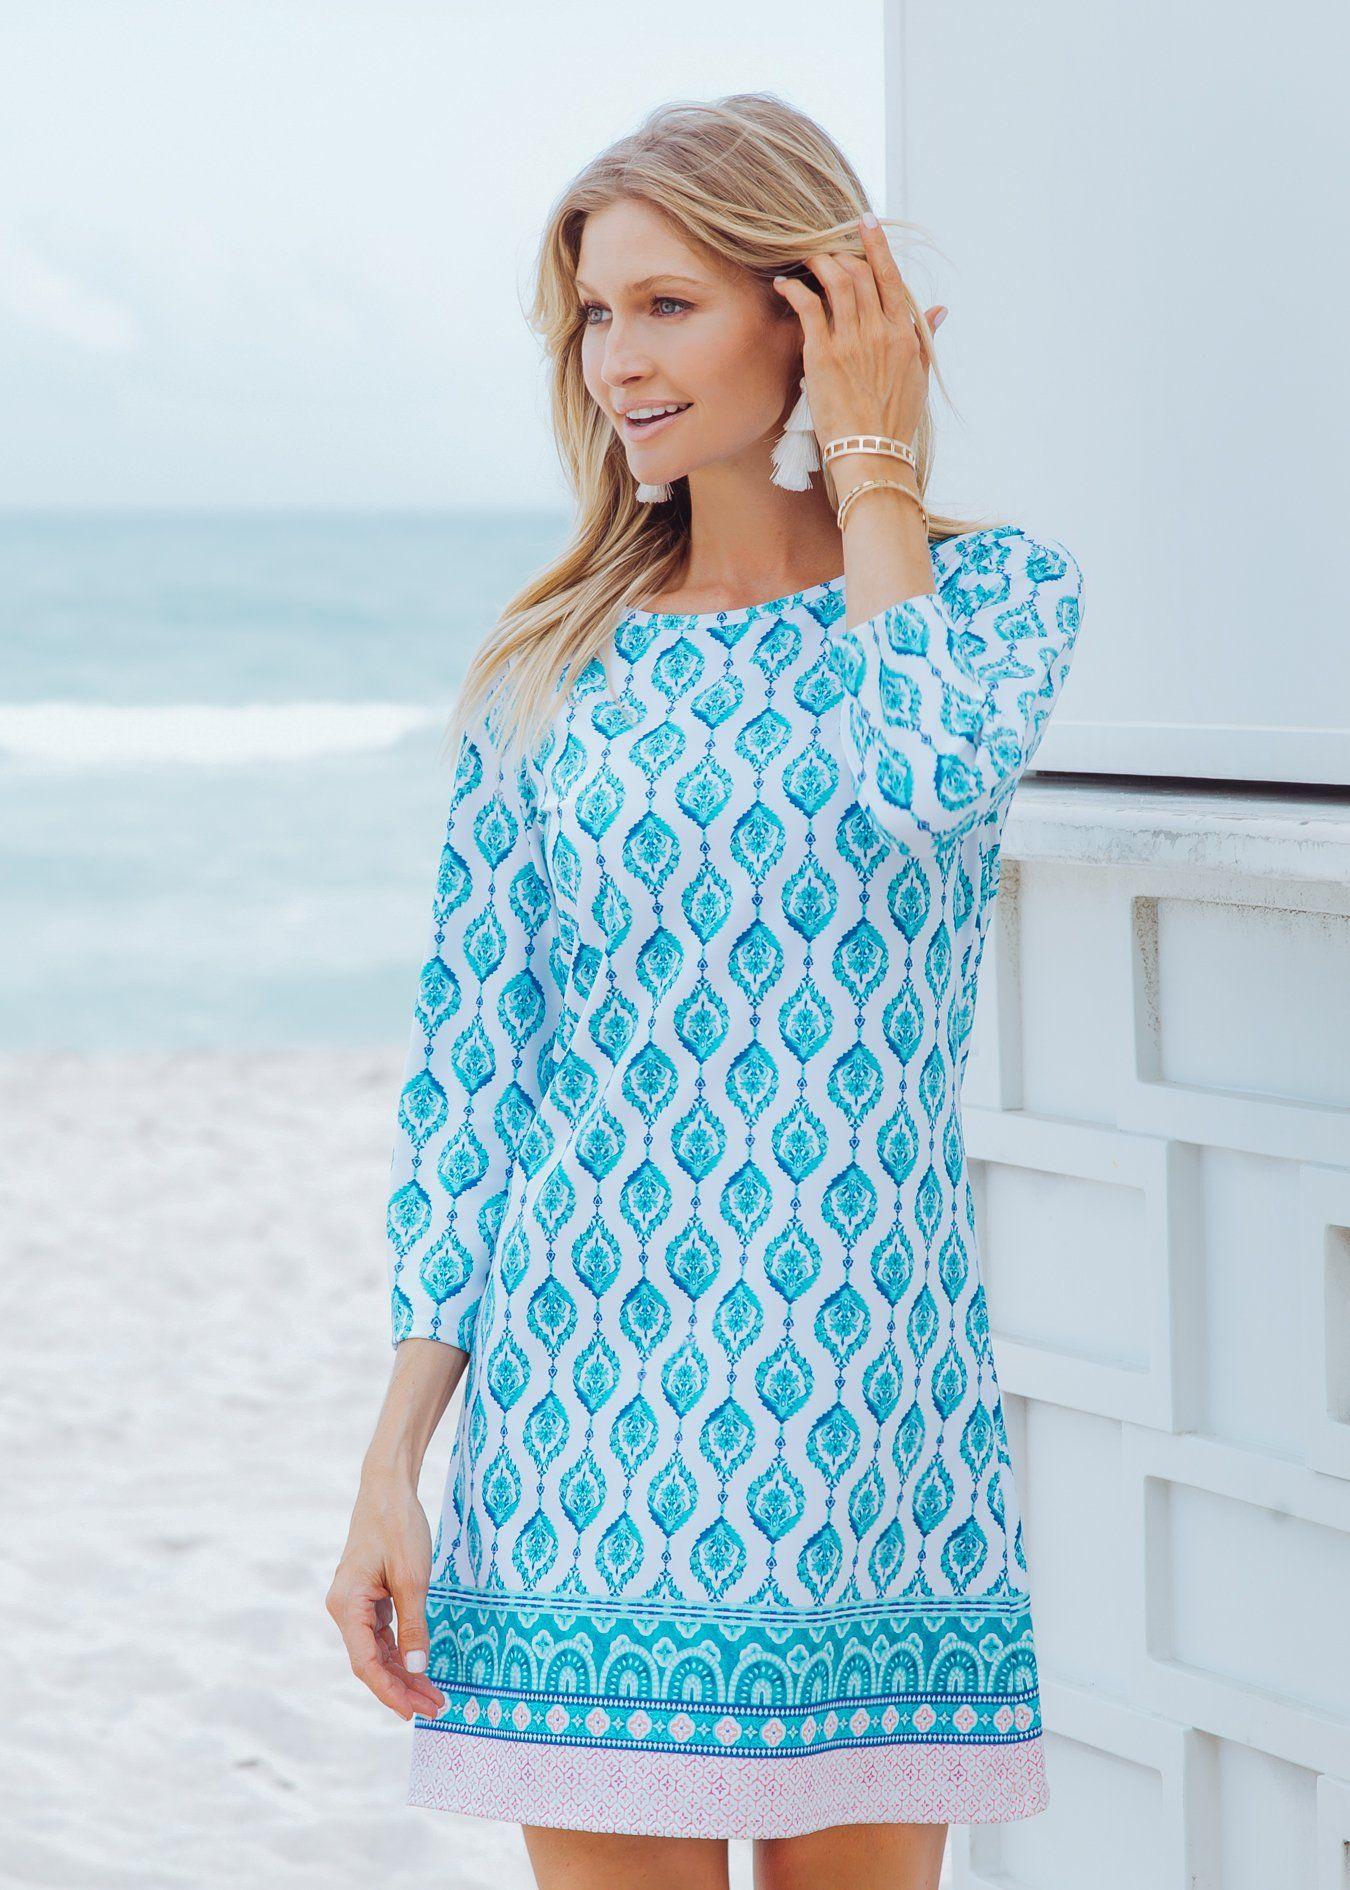 Santorini Cabana Shift Dress Cabana Life S New Vibrant Print Santorini Summer With 50 Uv Protection As Always Shift Dress Dresses Summer Shift Dress [ 1890 x 1350 Pixel ]